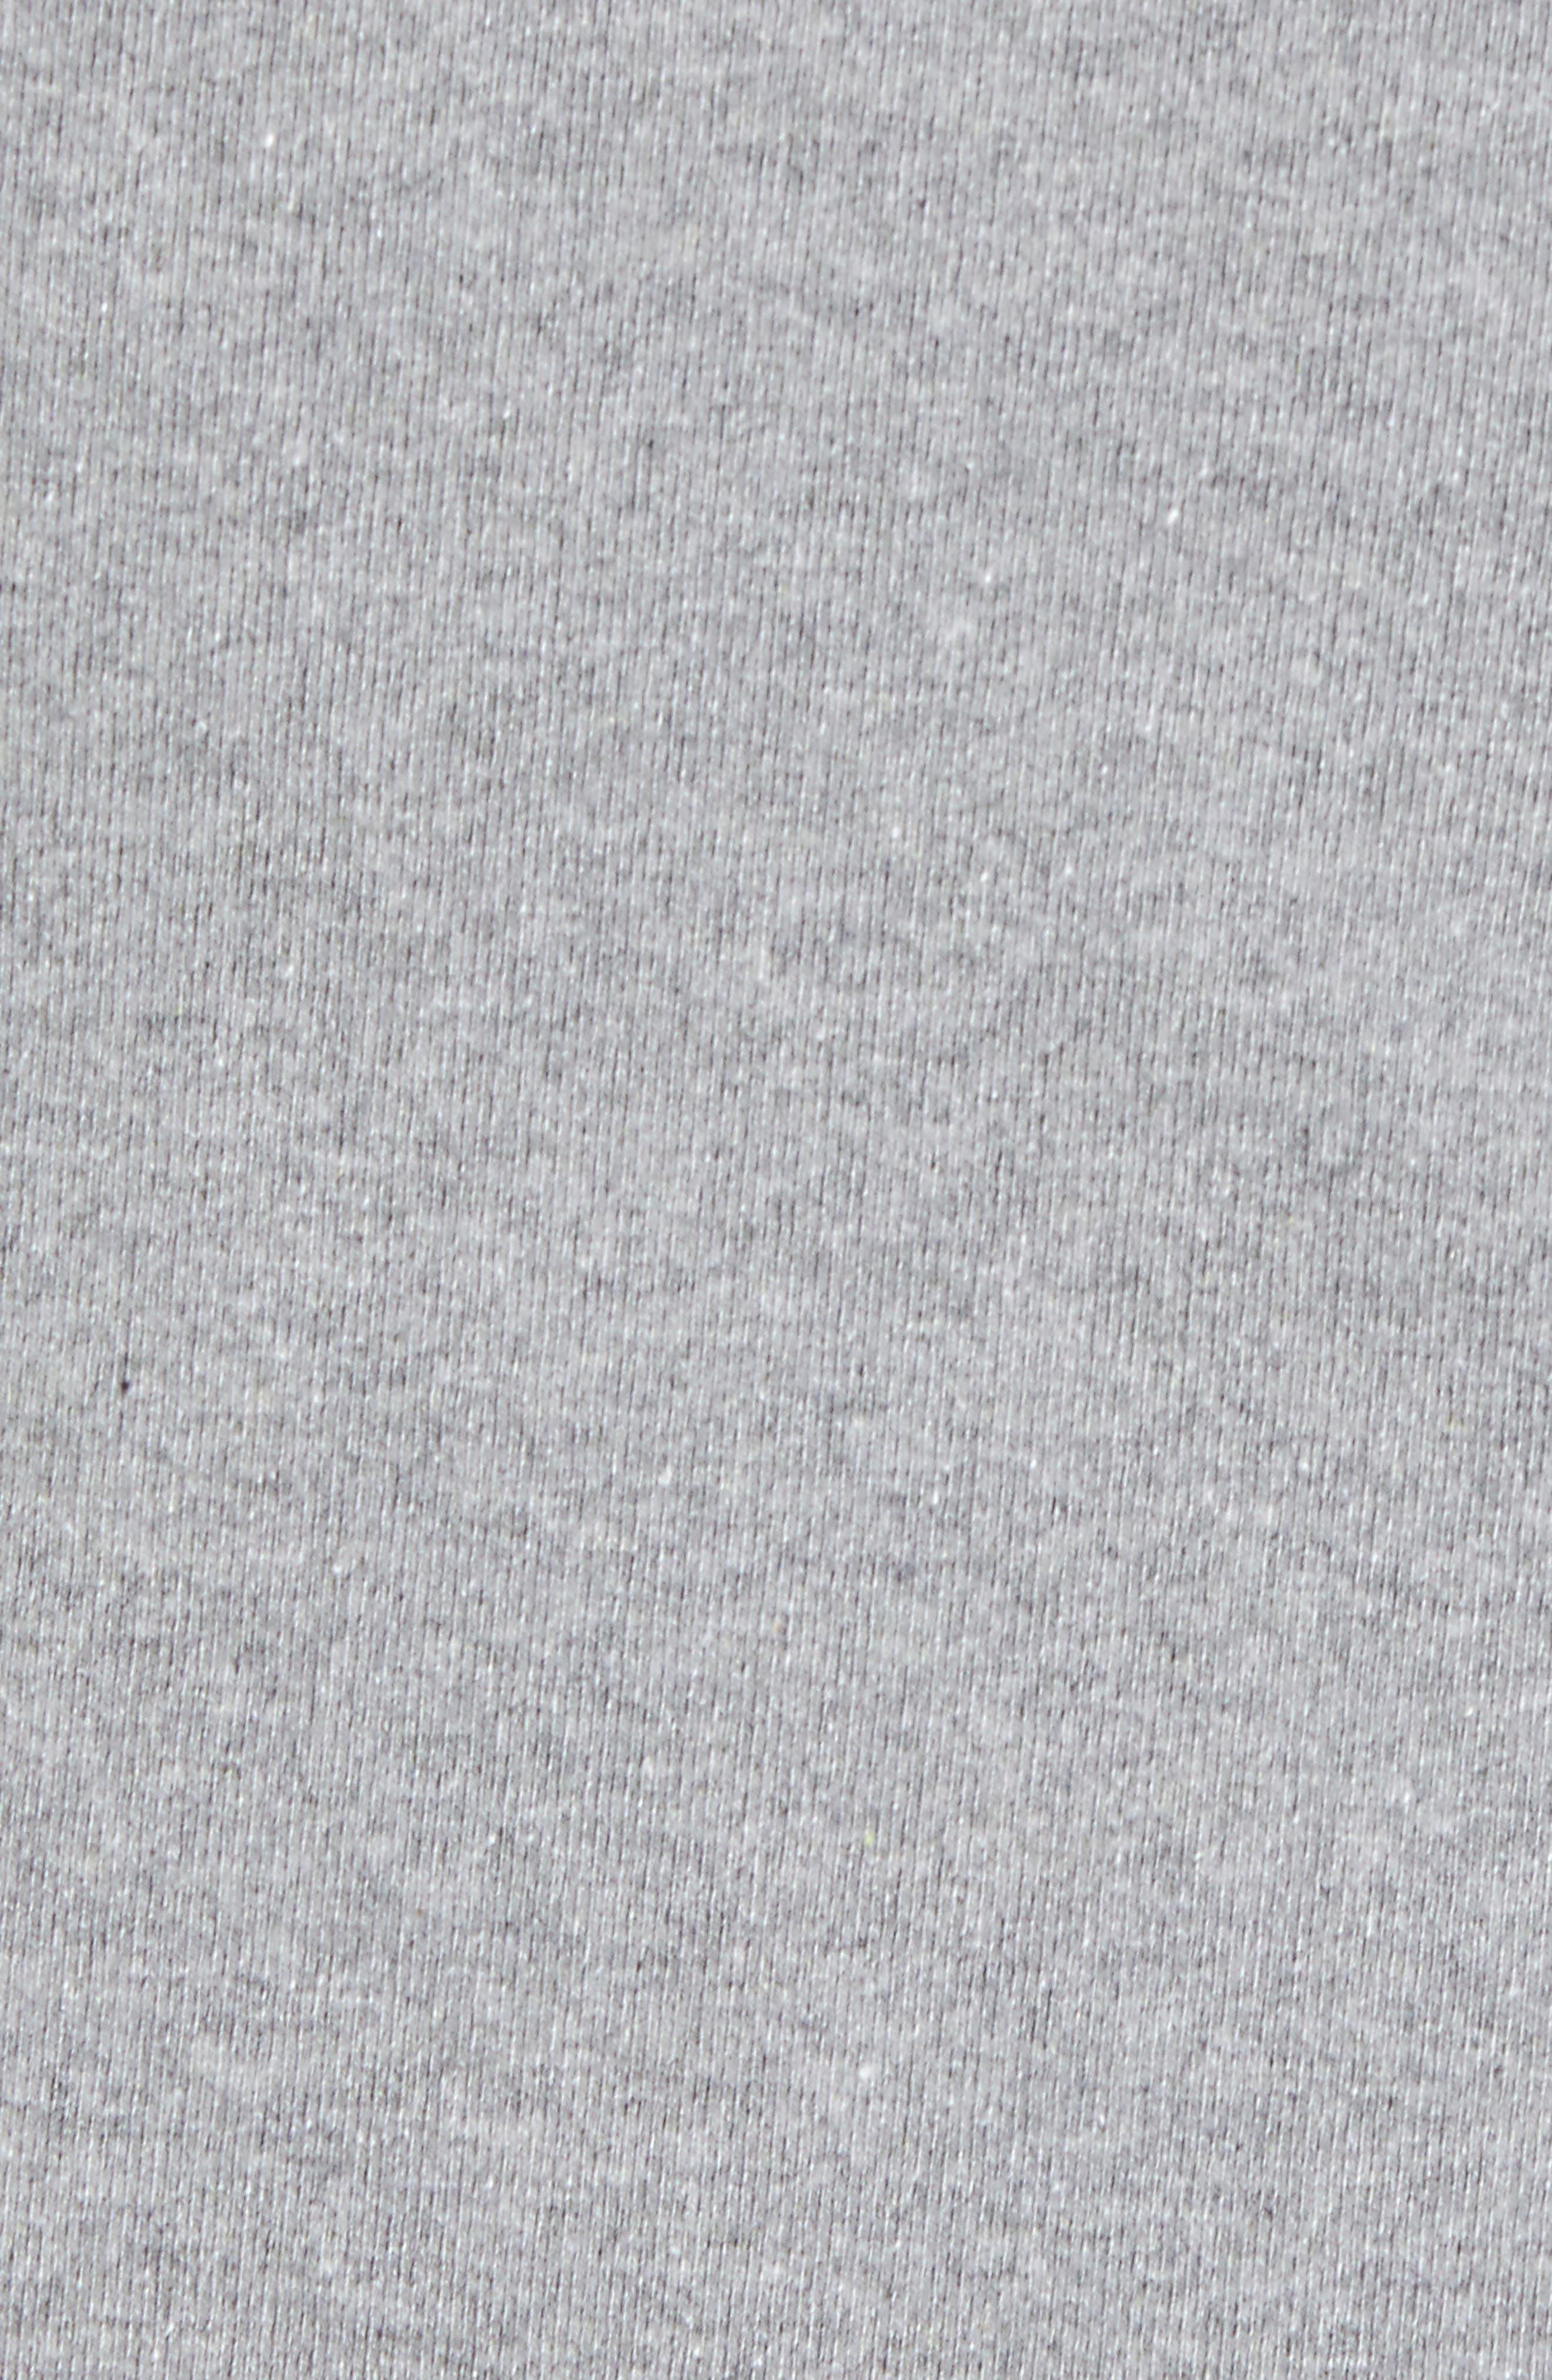 PATAGONIA,                             Shop Sticker Patch Uprisal Crew Sweatshirt,                             Alternate thumbnail 5, color,                             GRAVEL HEATHER